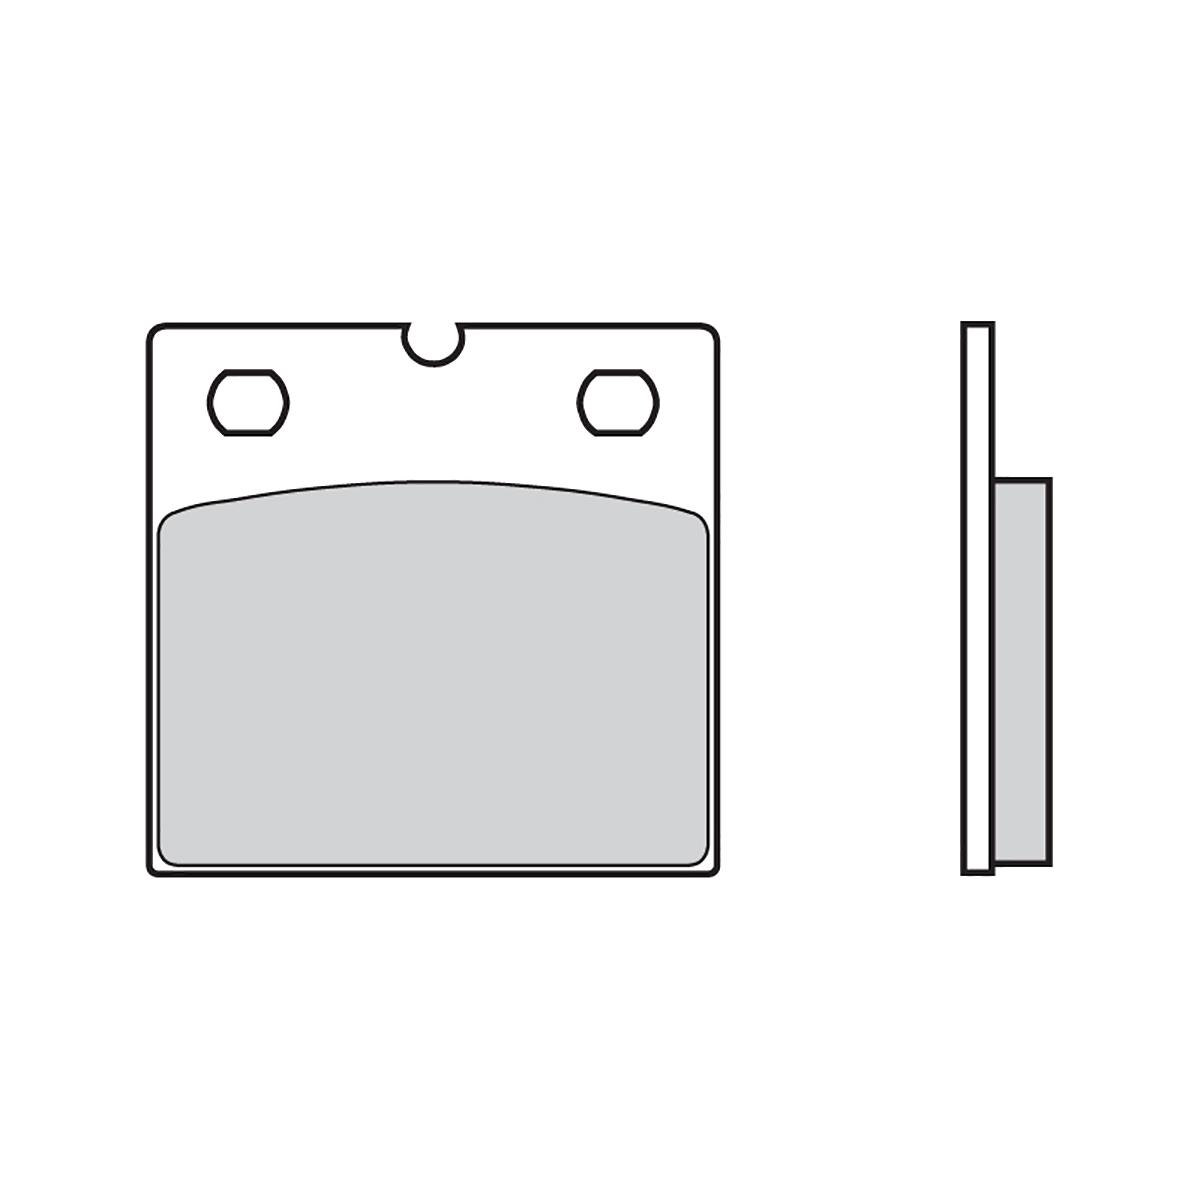 Vorderen Brembo 07 Bremsbelage fur Bmw R 65/1 650 1986 > 1992